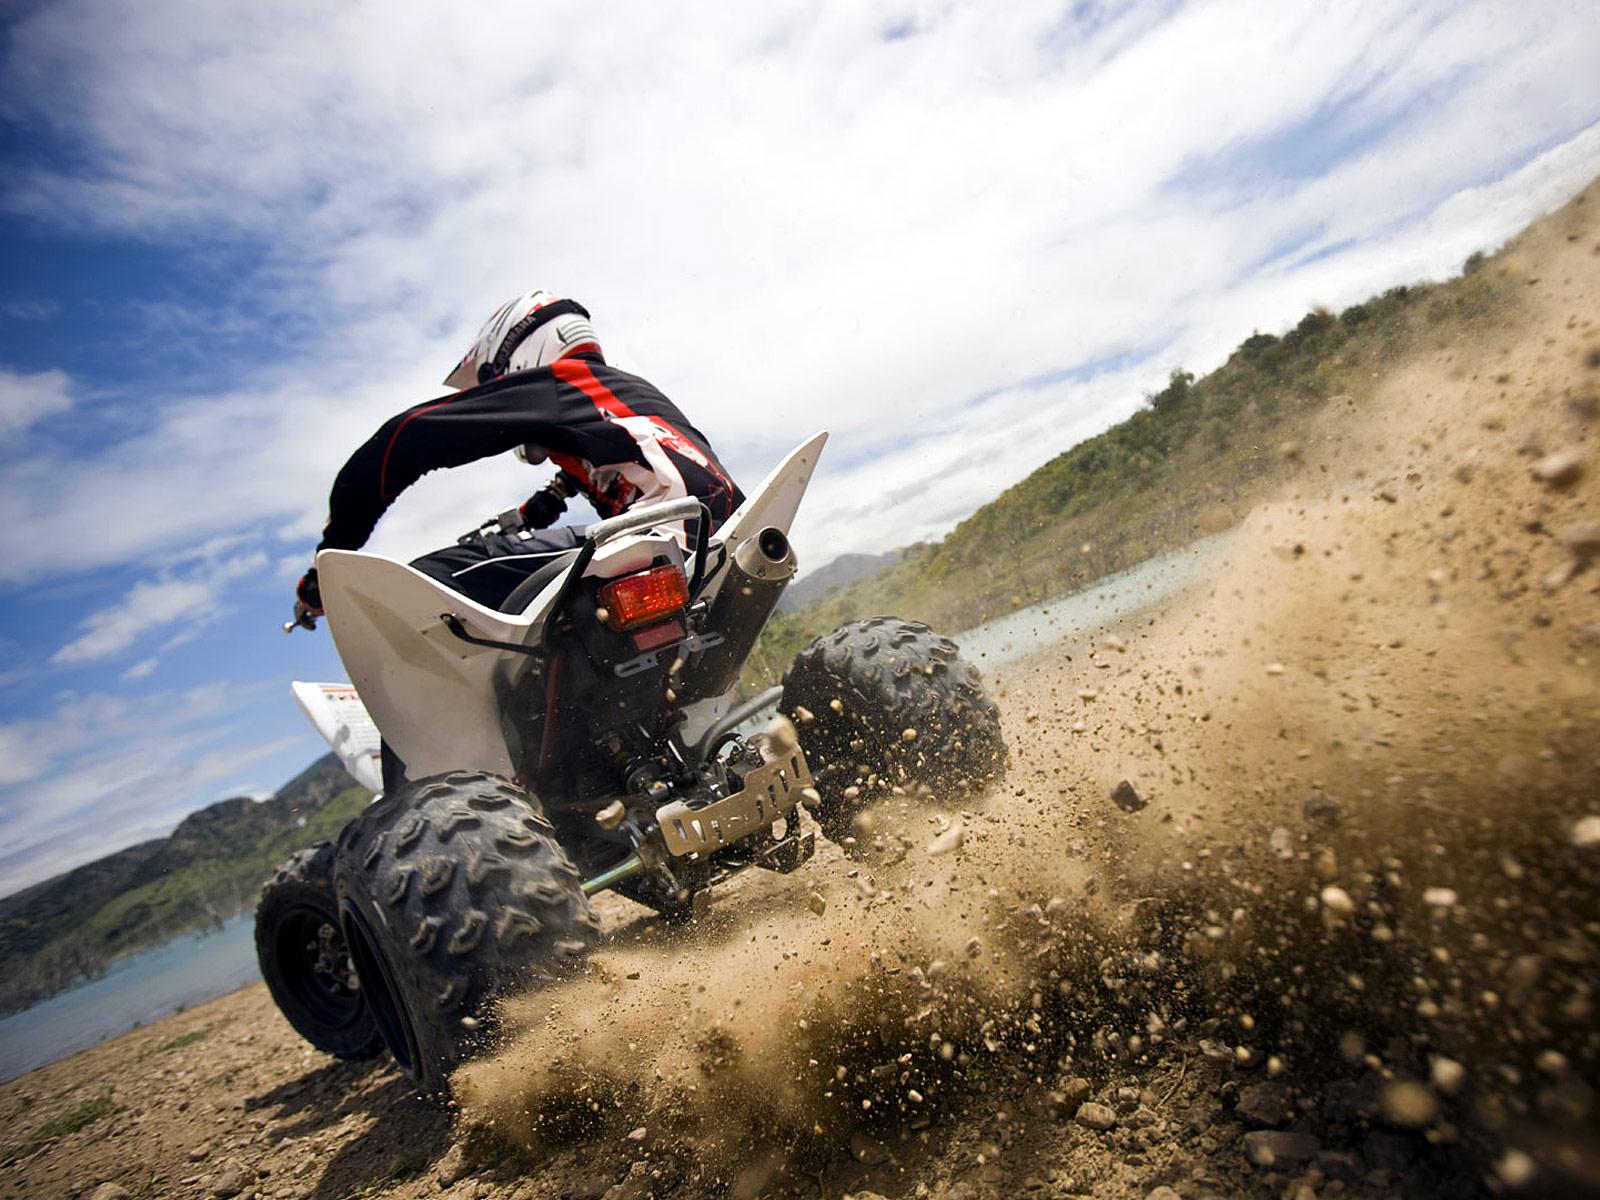 2009 YAMAHA Raptor 250 VFM250R ATV Wallpapers